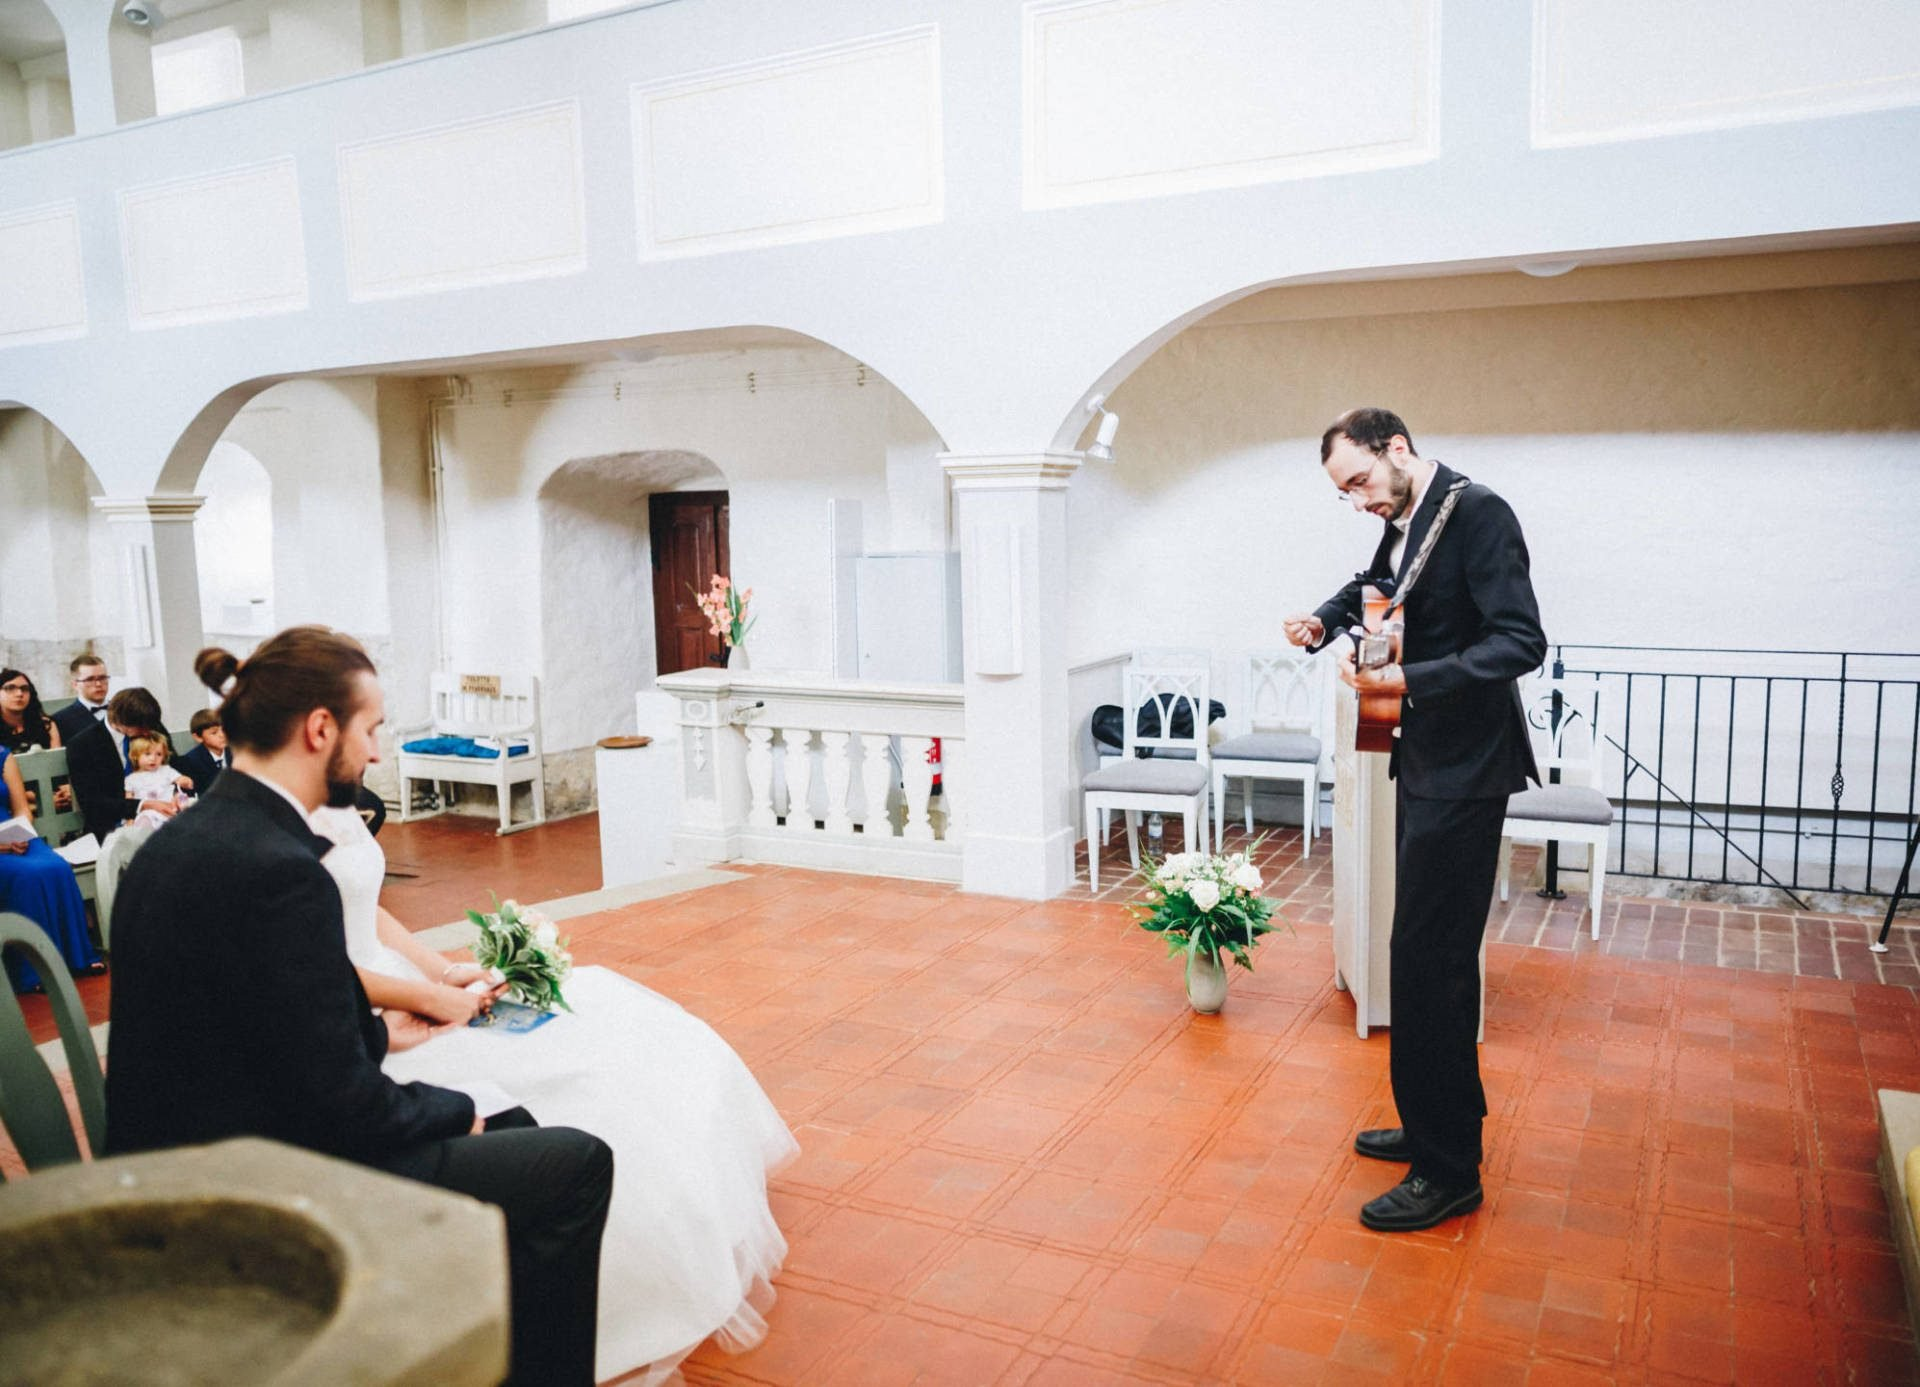 JuleSascha 14 1920x1387 - Hochzeit im alten Dornburger Schloss